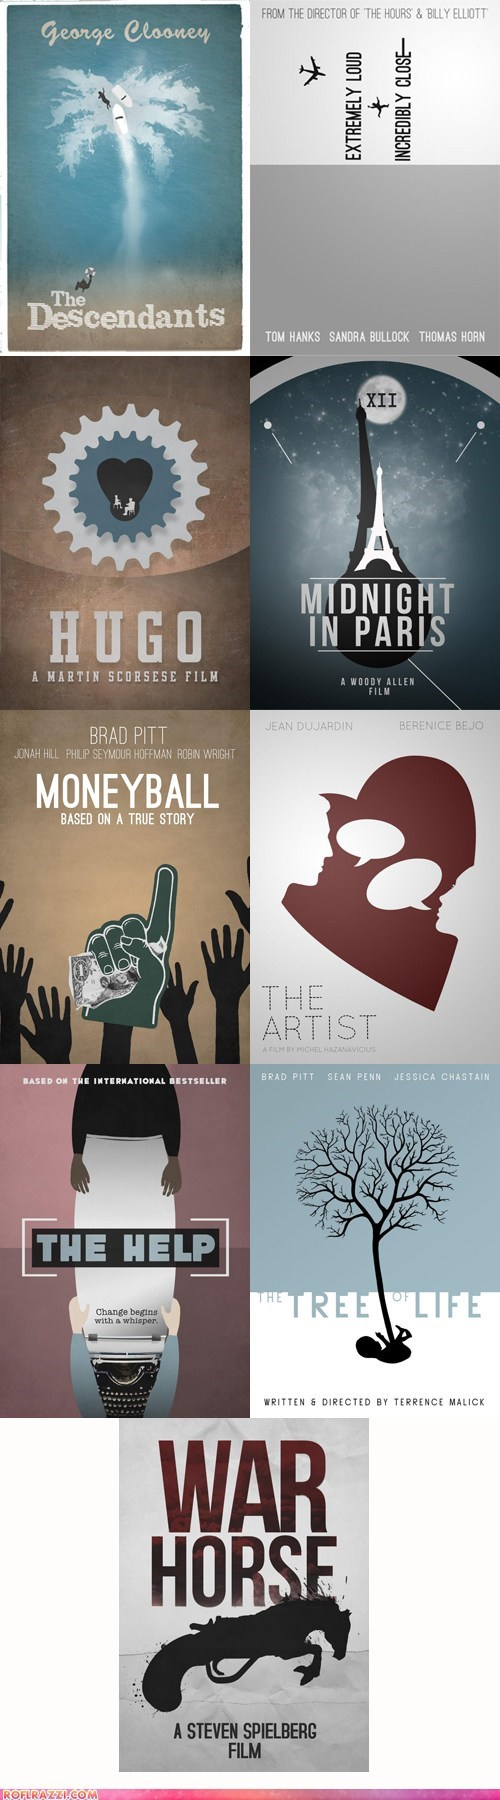 academy awards,art,cool,Movie,oscar,poster